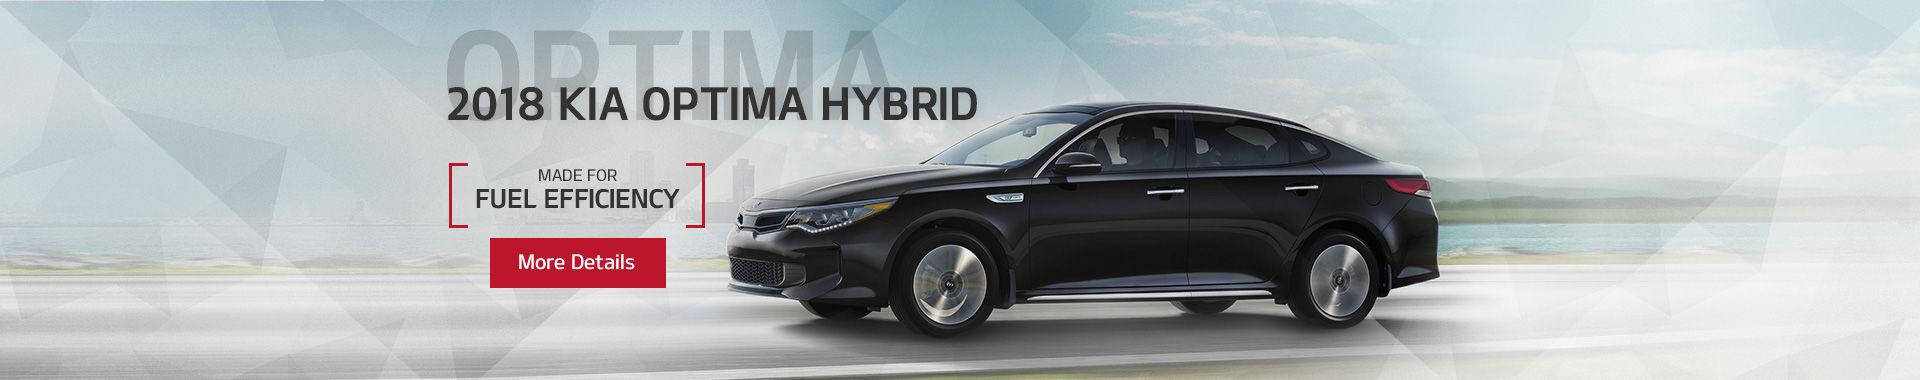 2018 Optima Hybrid